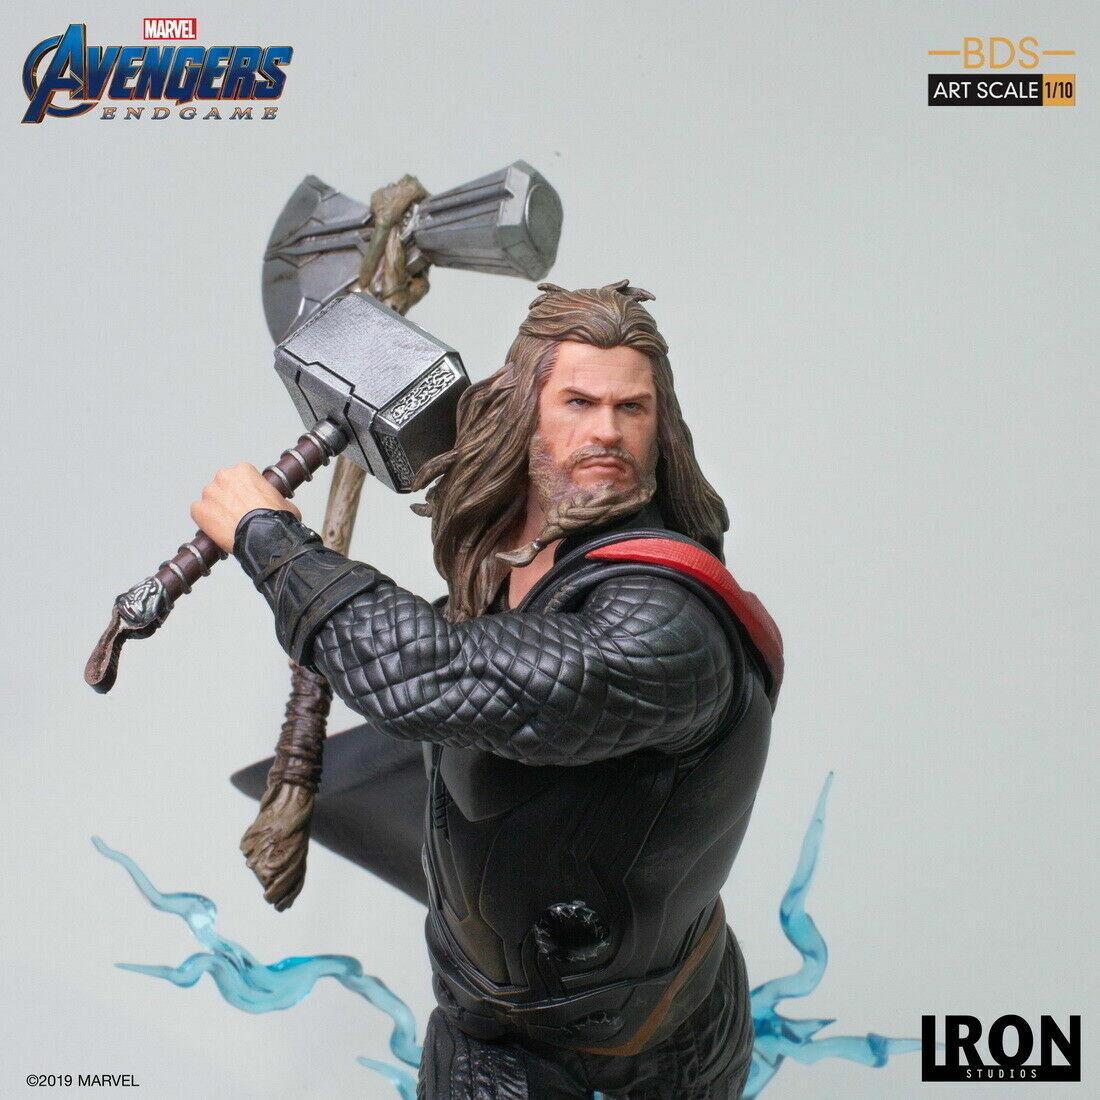 1 10 Iron Studios MARCAS19419-10  Avengers Endgioco Thor Limited Resin Statue giocattolo  negozio outlet